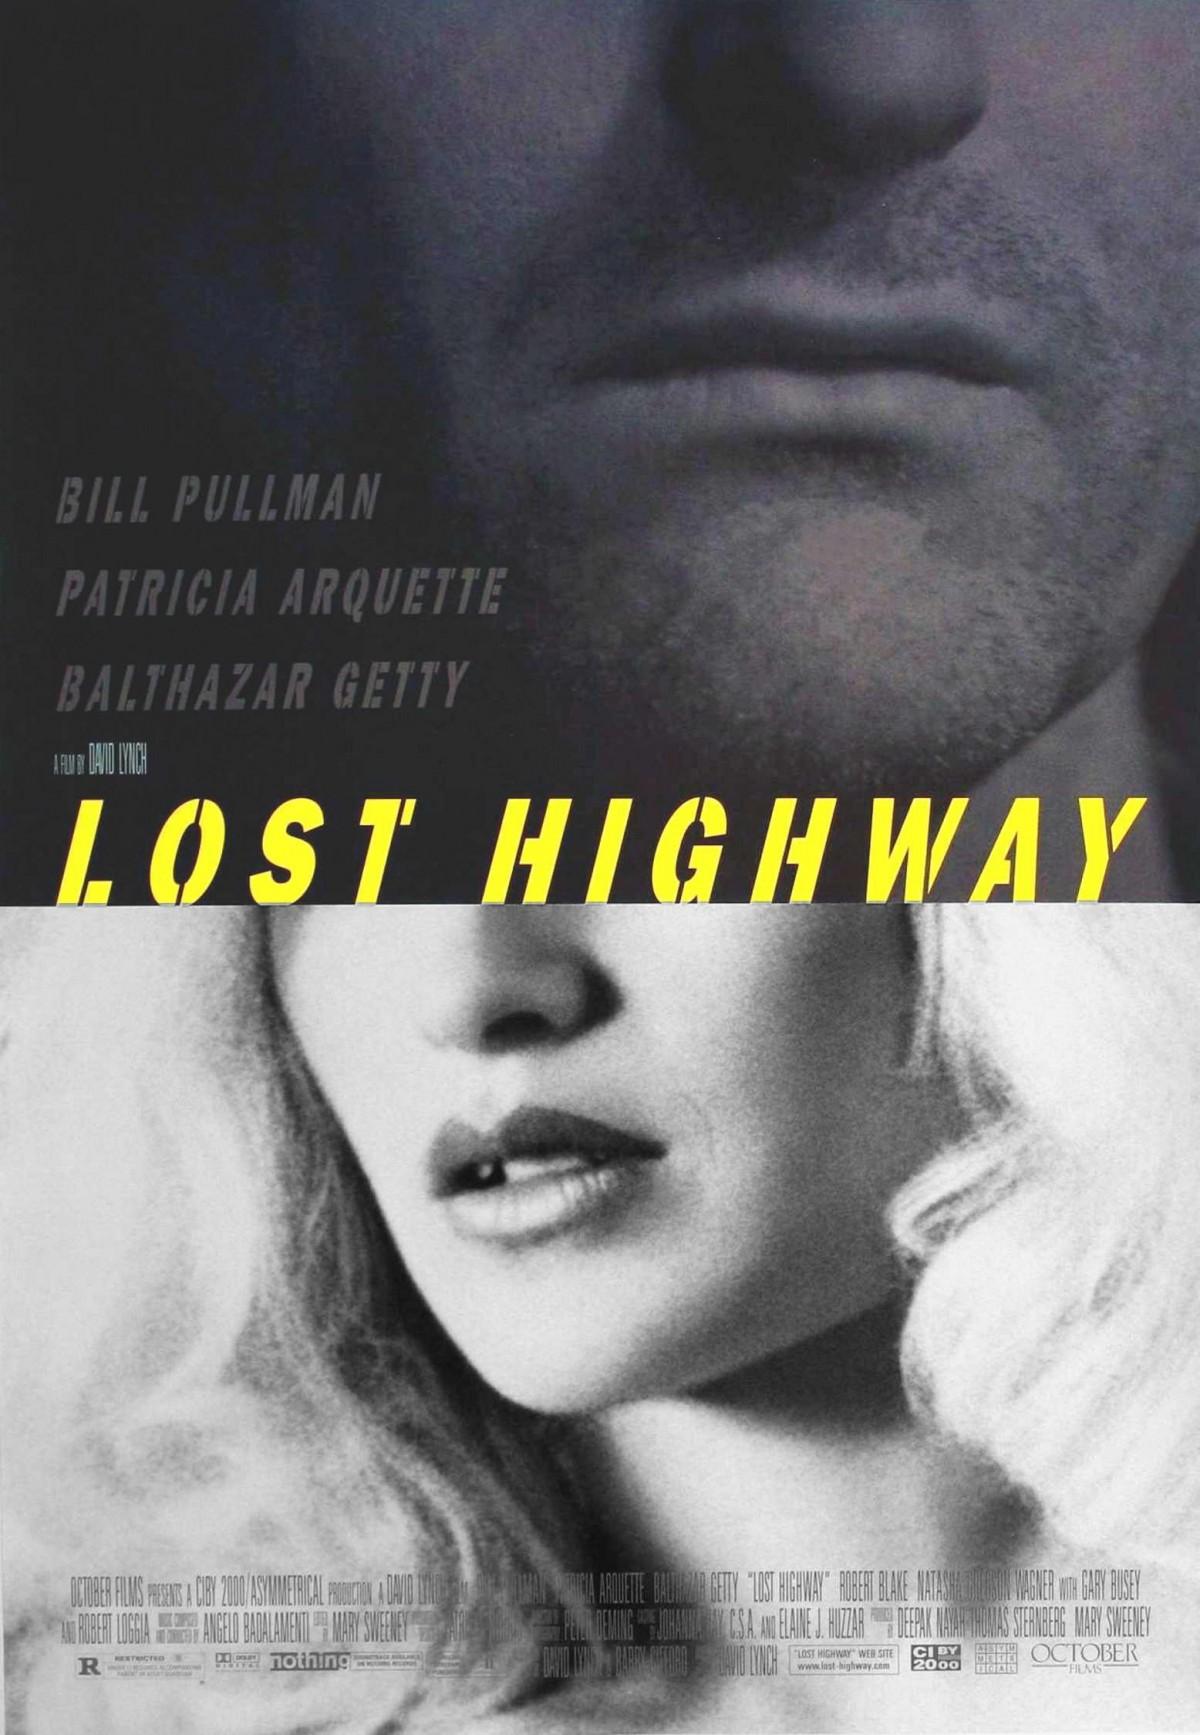 61. Lost Highway (1997)